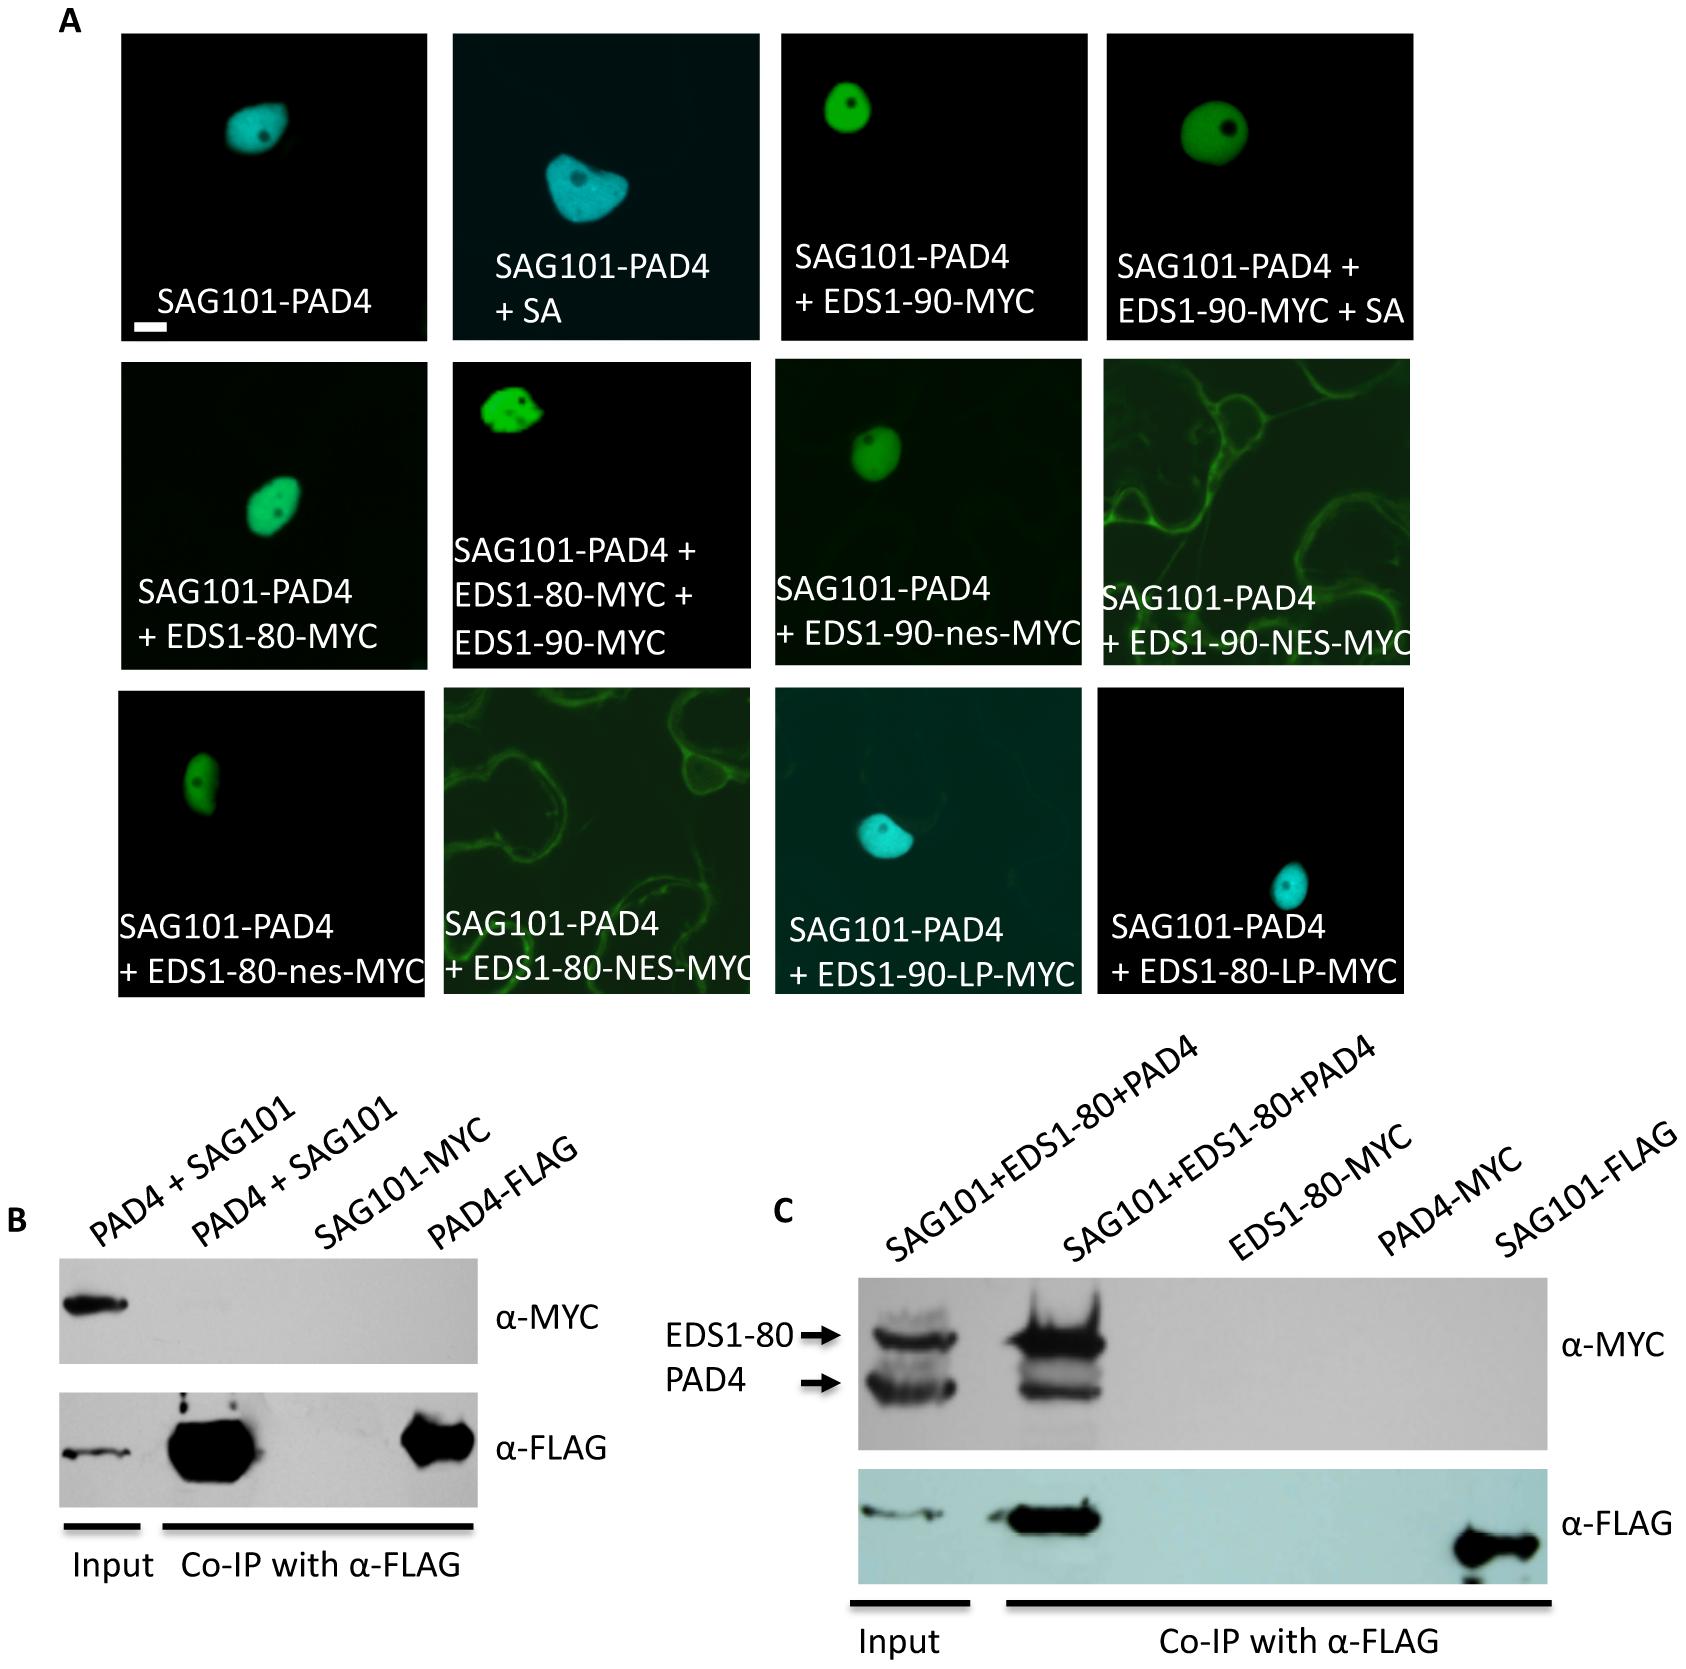 EDS1 facilitates the interaction between SAG101 and PAD4.